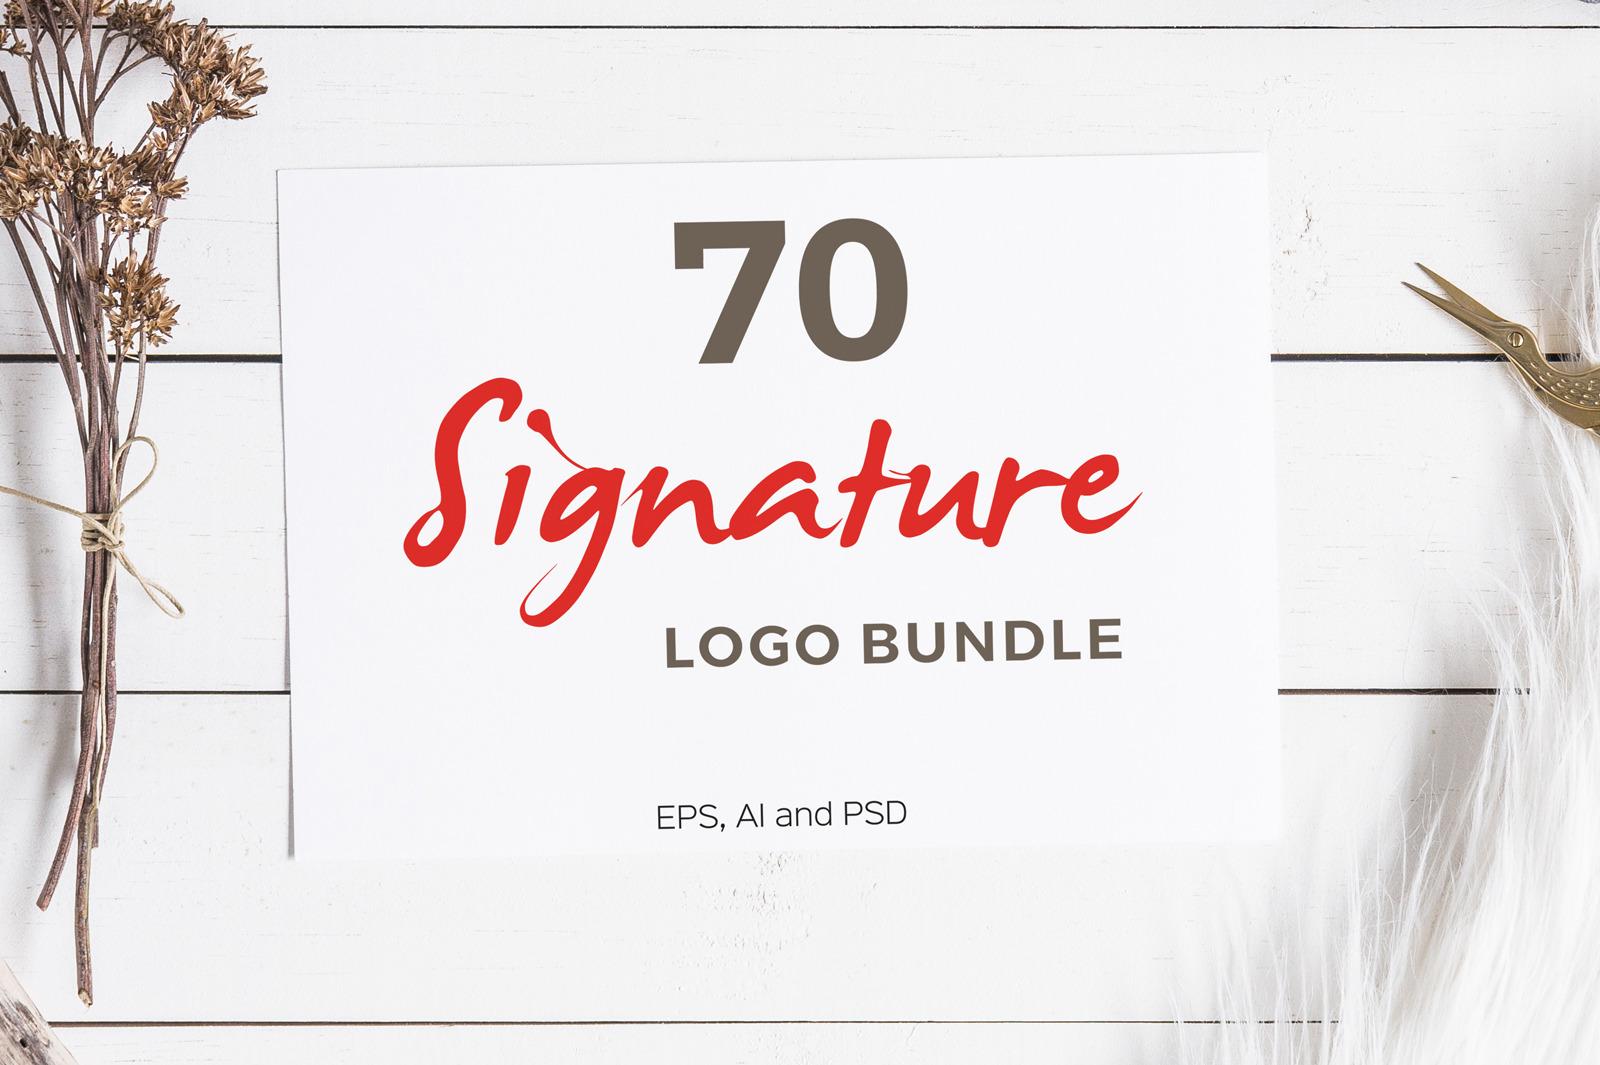 70 Signature Logo Bundle